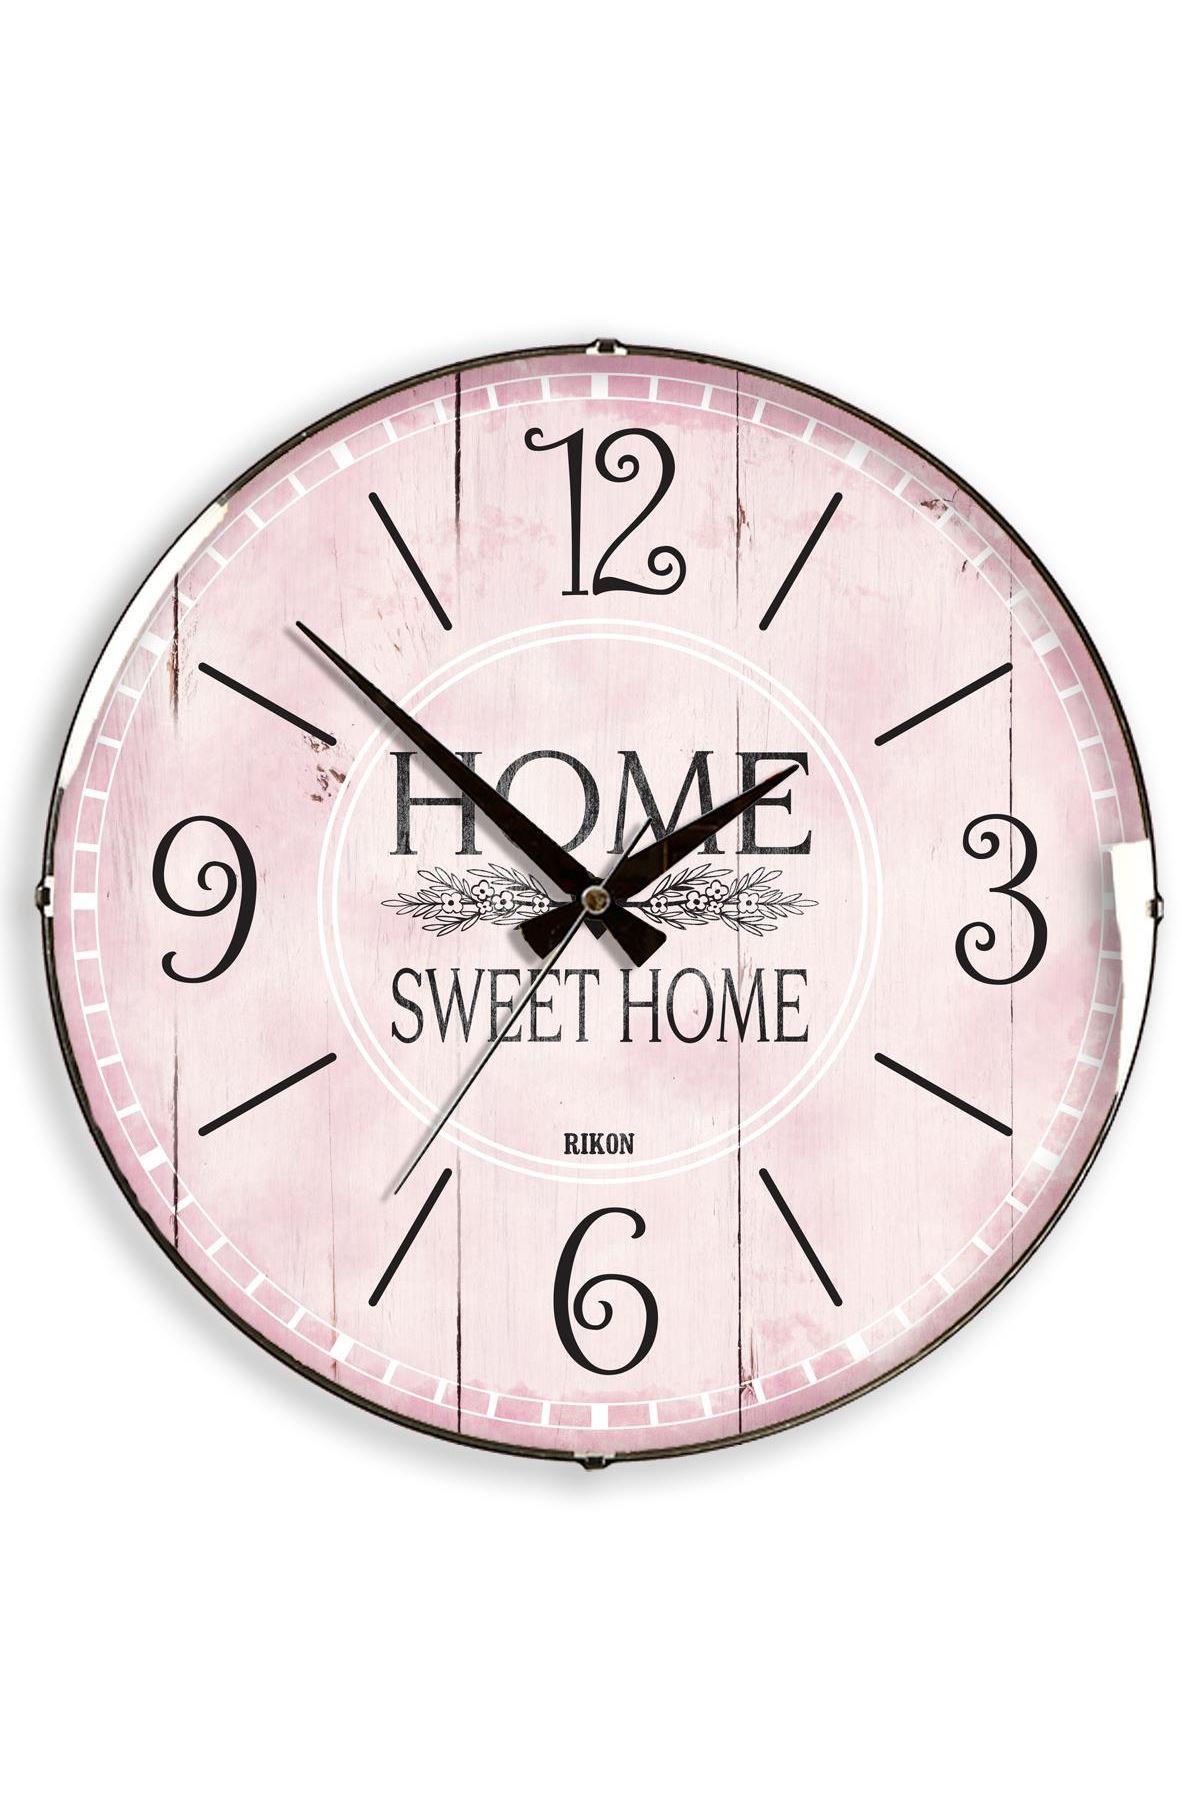 Rikon Home Swet Dekoratif Bombe Camlı Duvar Saati 35X35 Cm